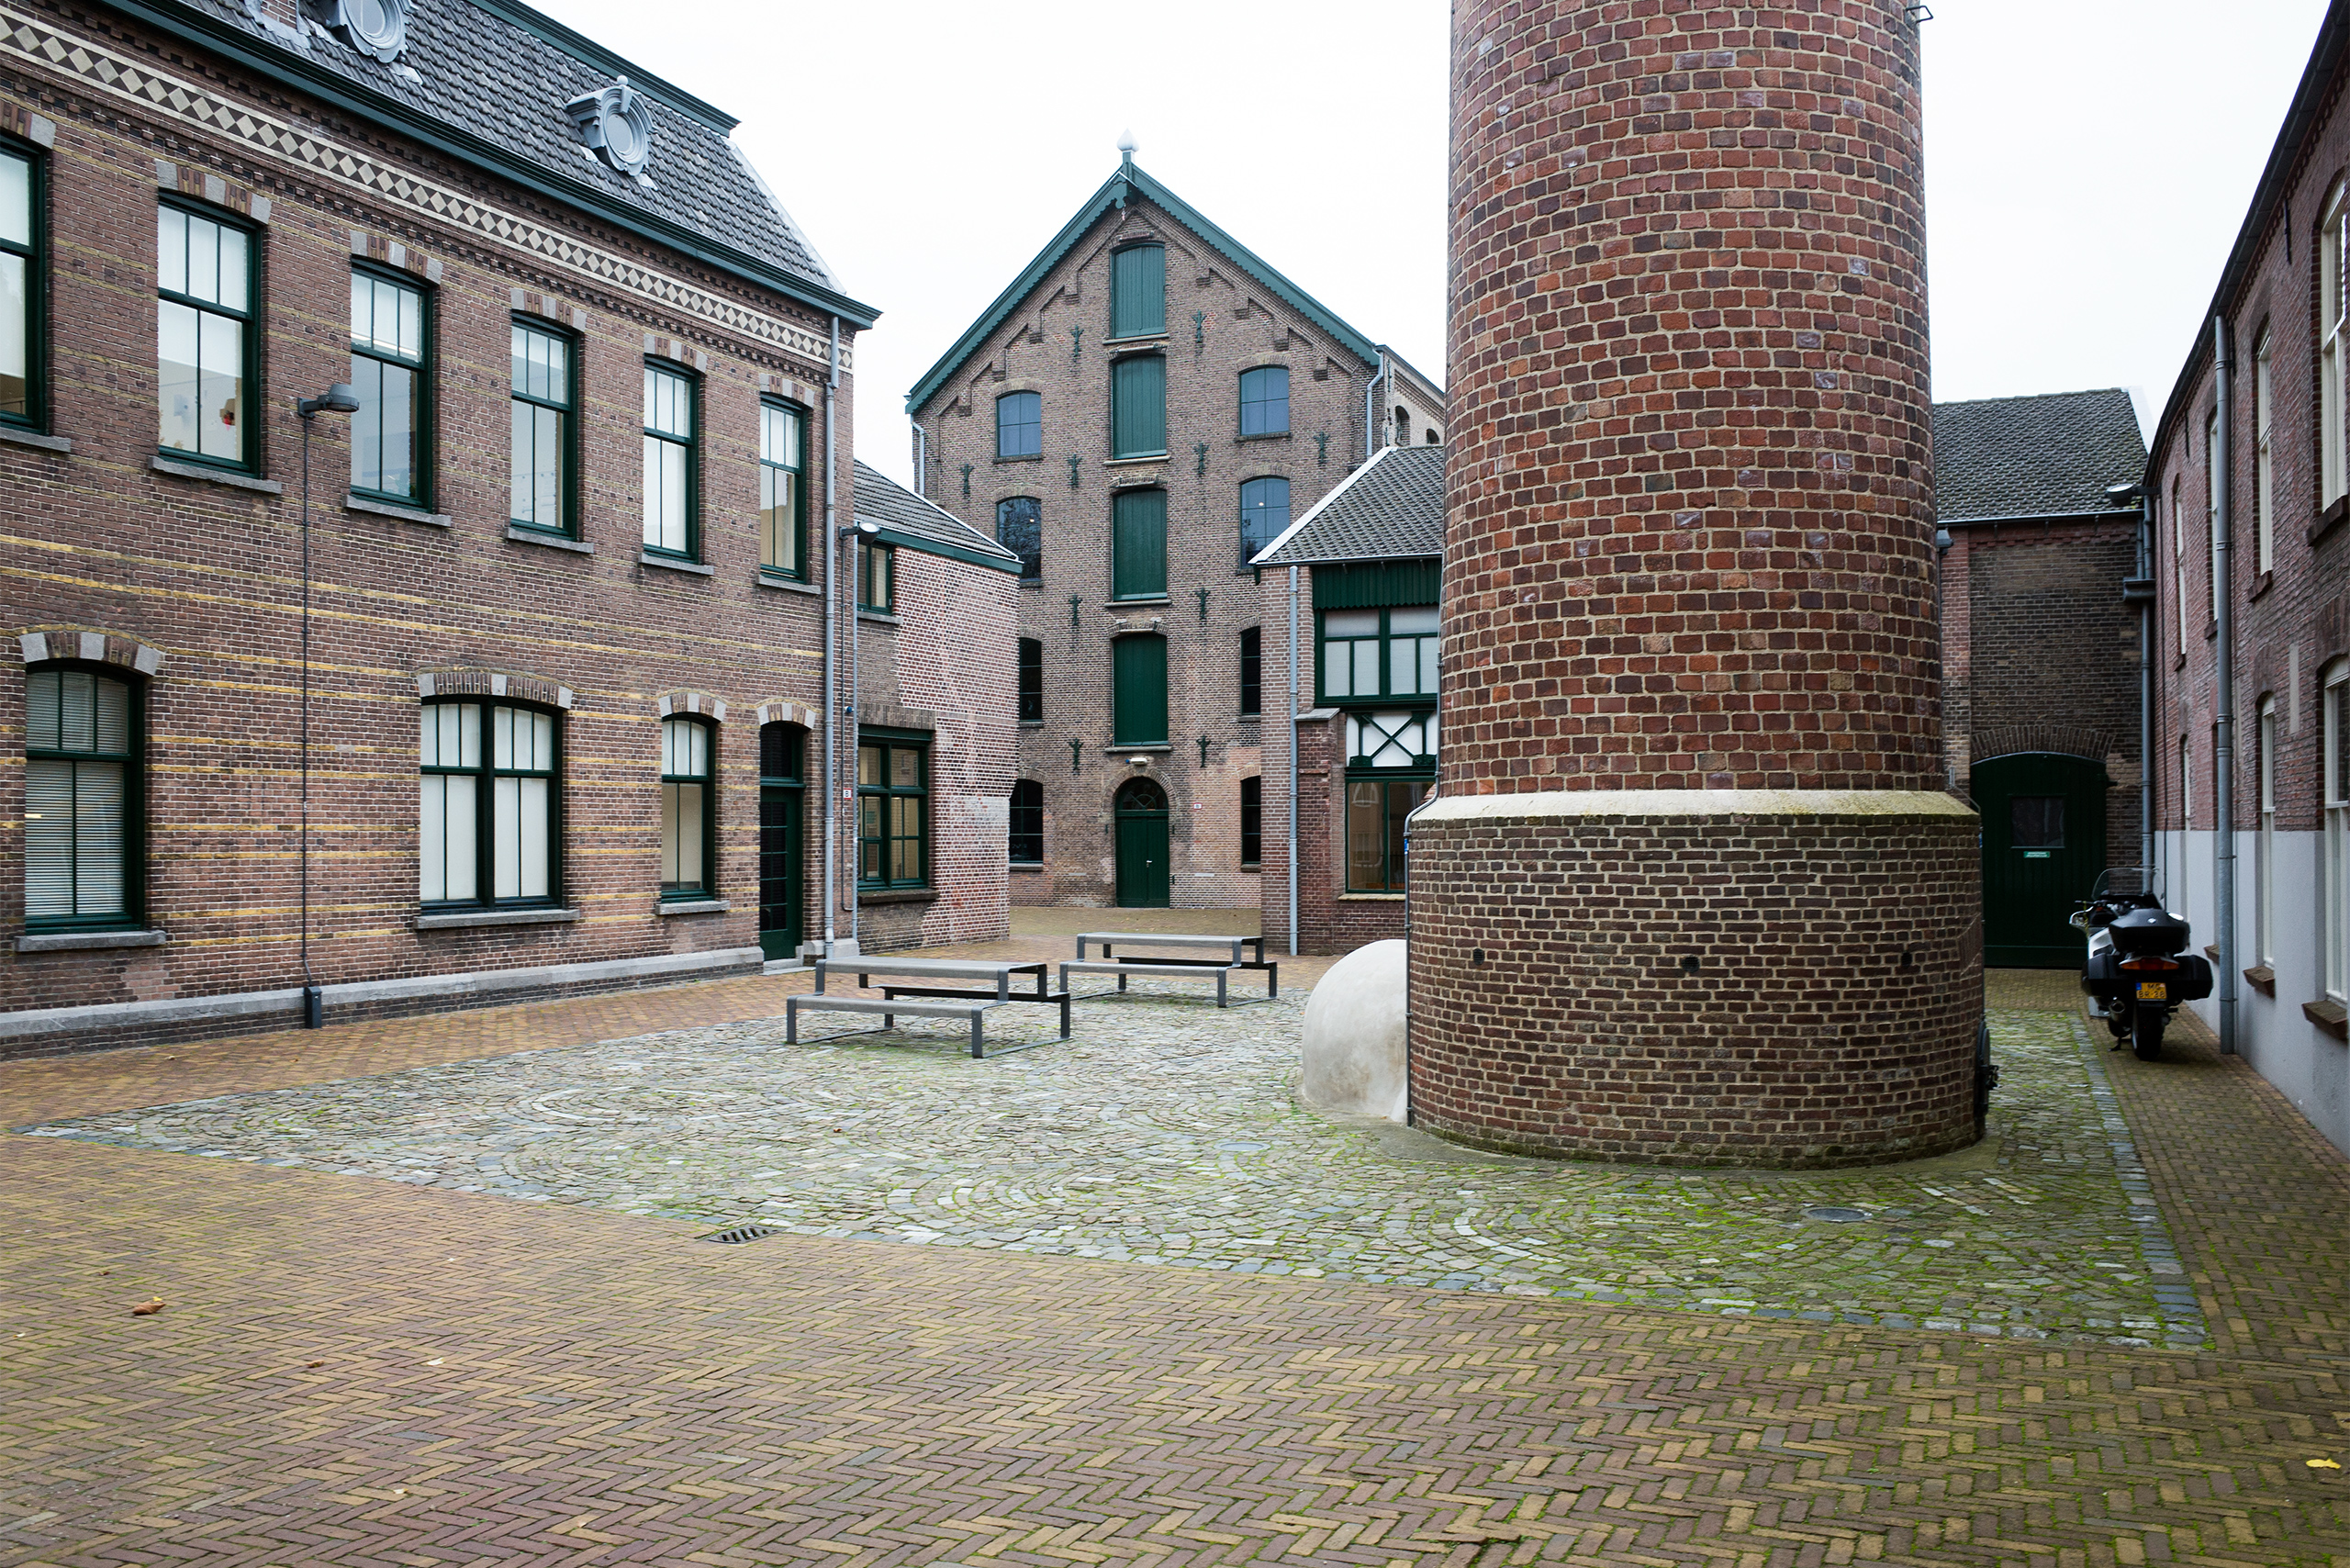 TextielMuseum and TextielLab in Tilburg